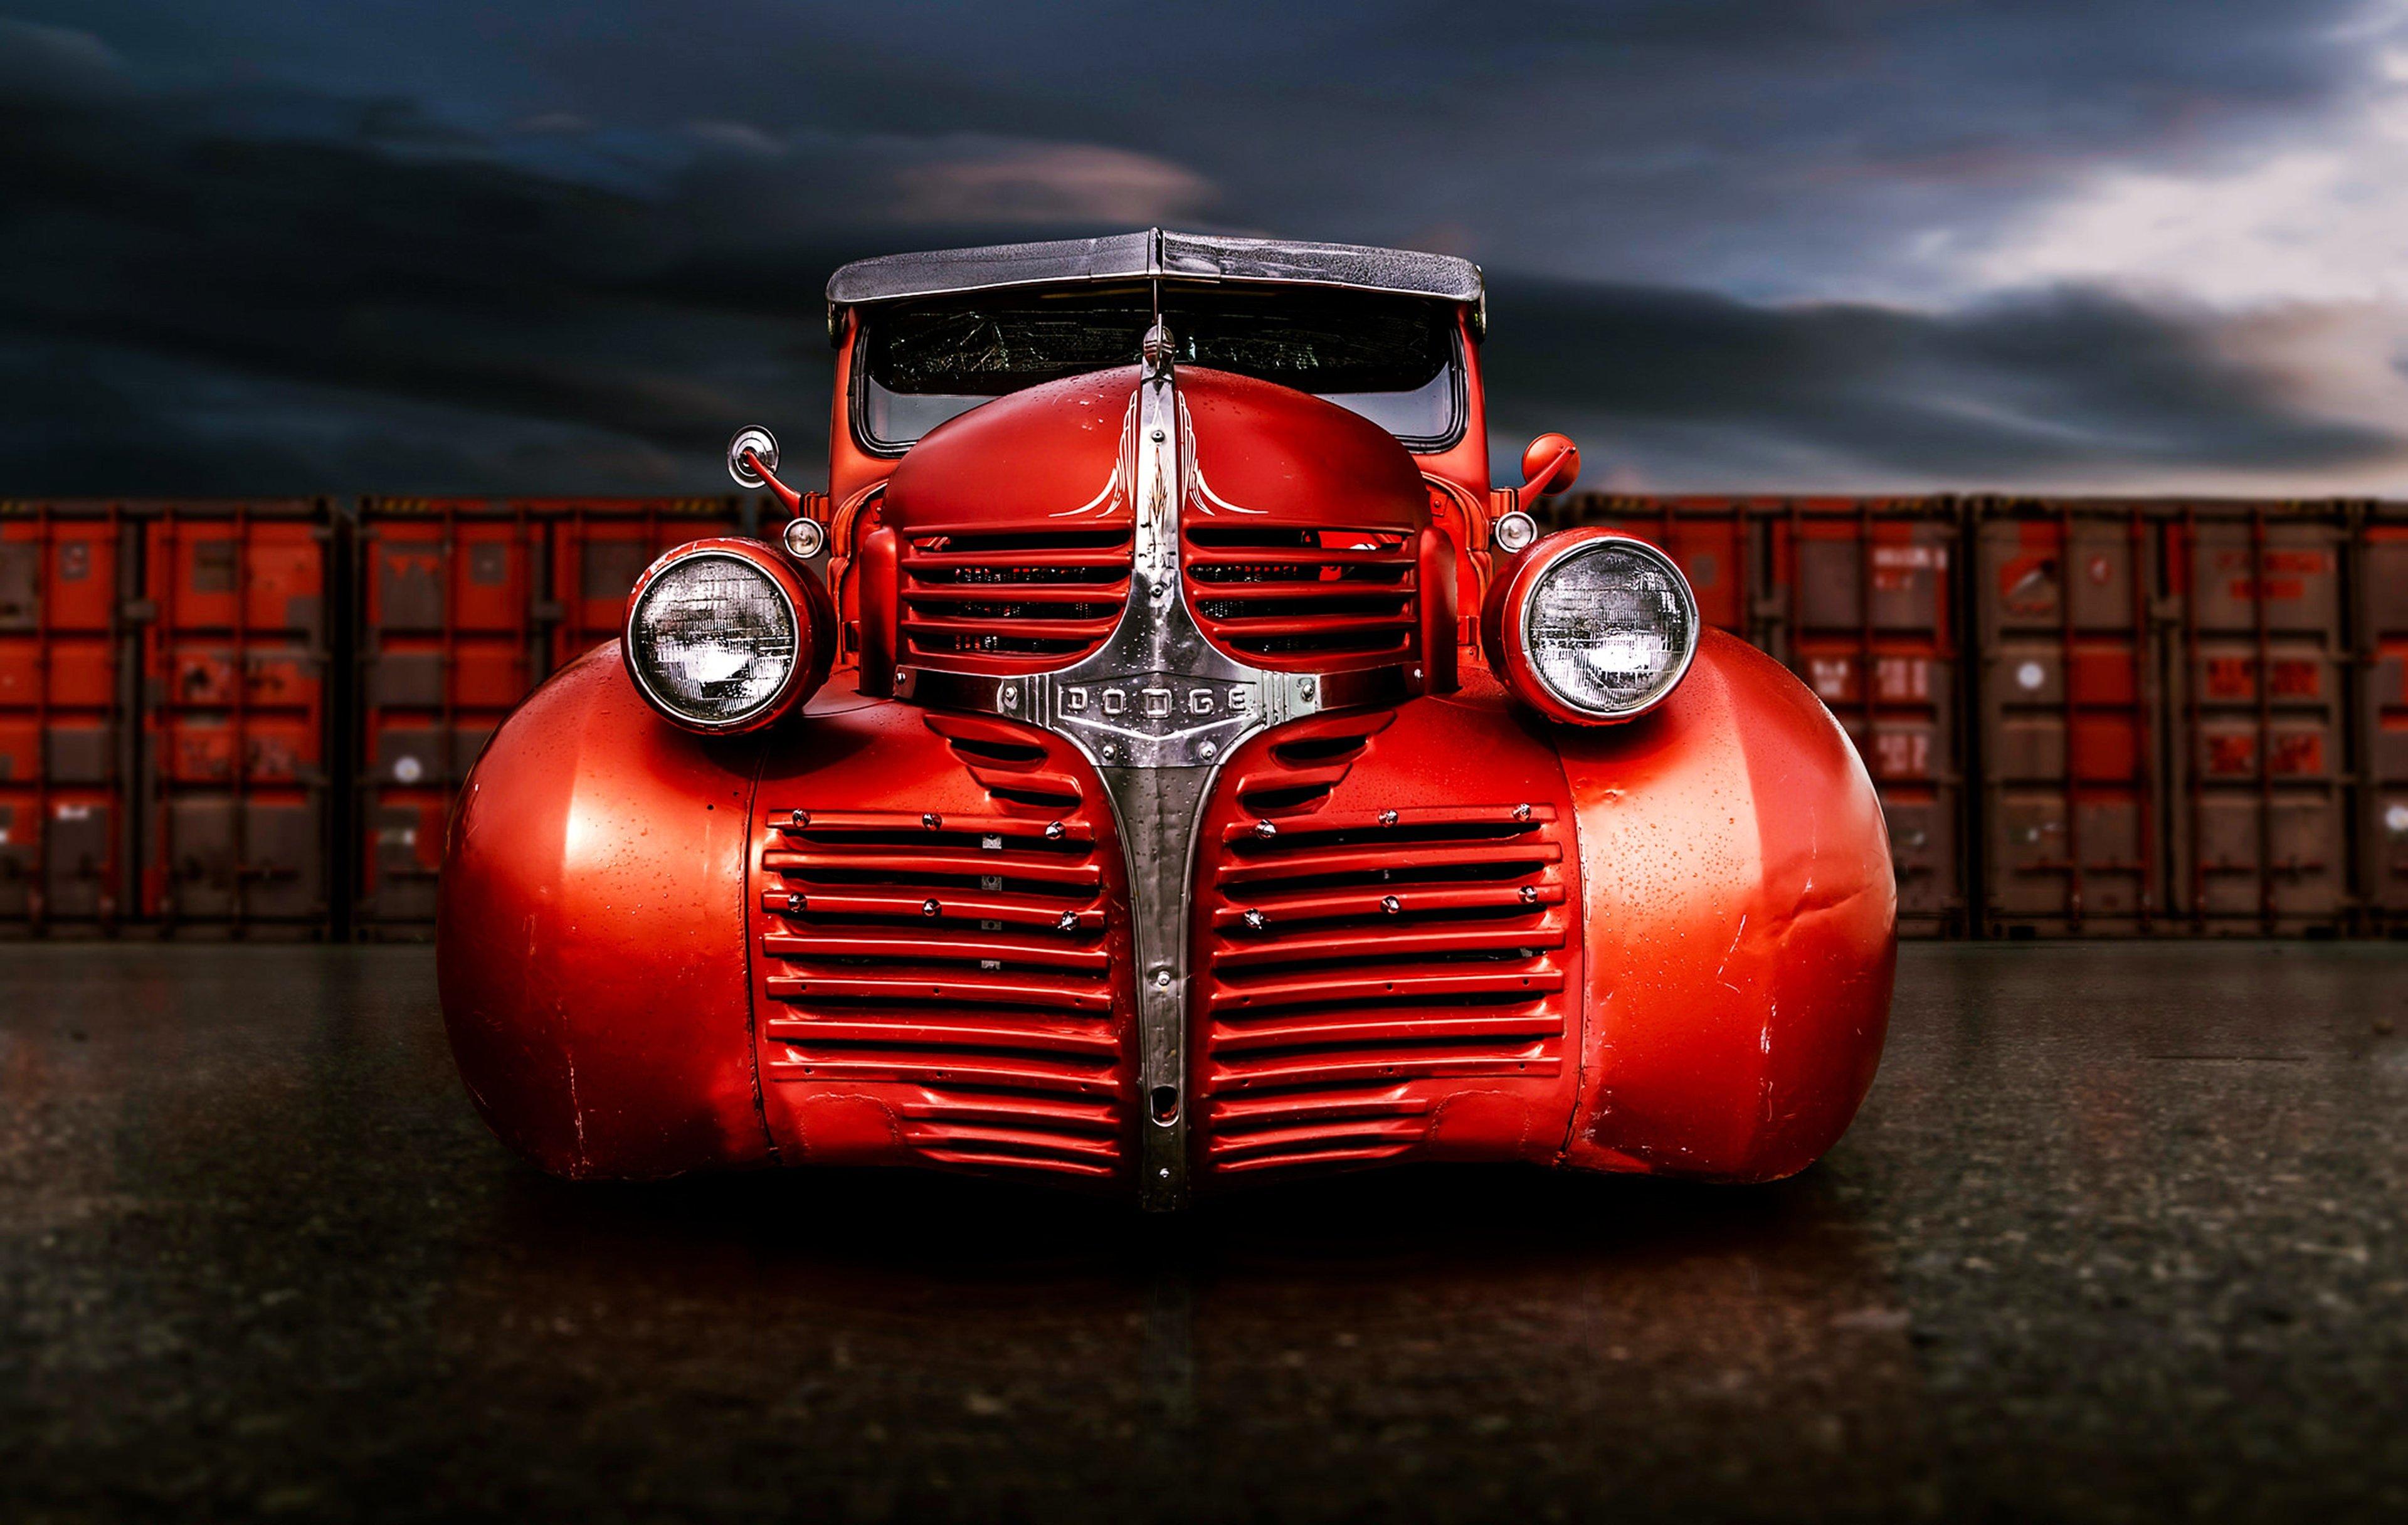 dodge old classic red motors cars trucks wallpaper. Black Bedroom Furniture Sets. Home Design Ideas